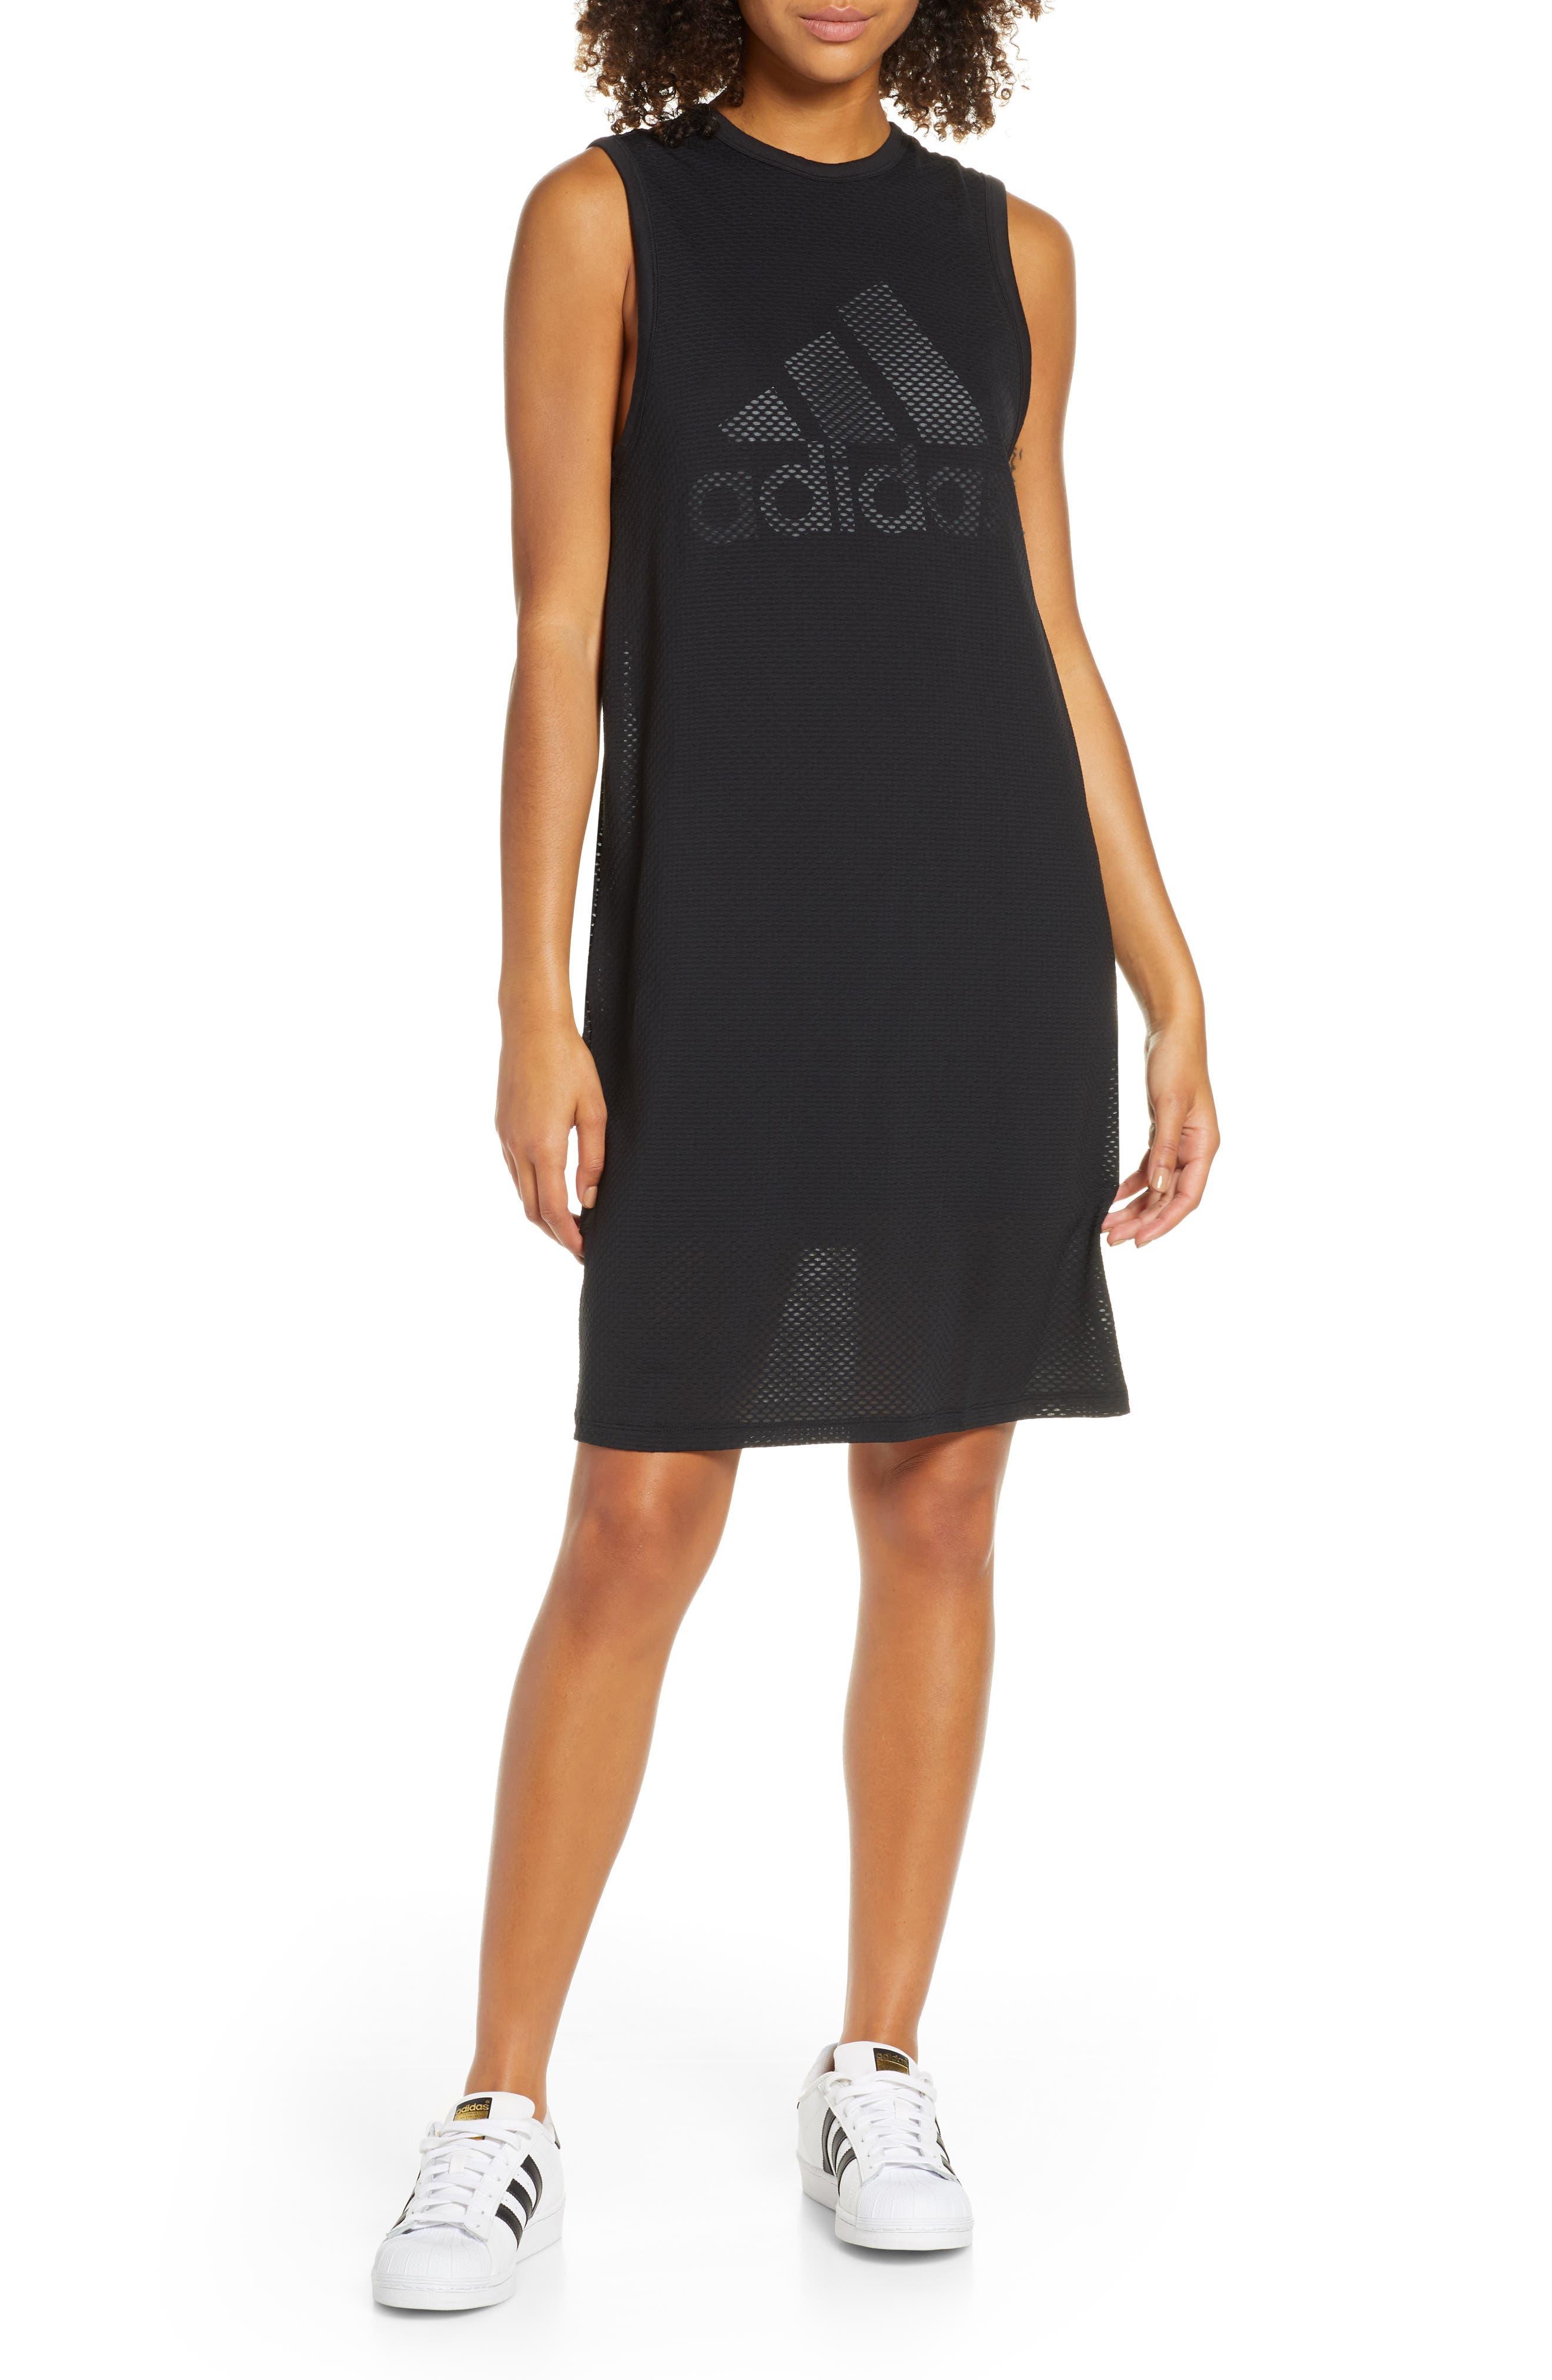 Adidas Logo Mesh & Jersey Tank Dress